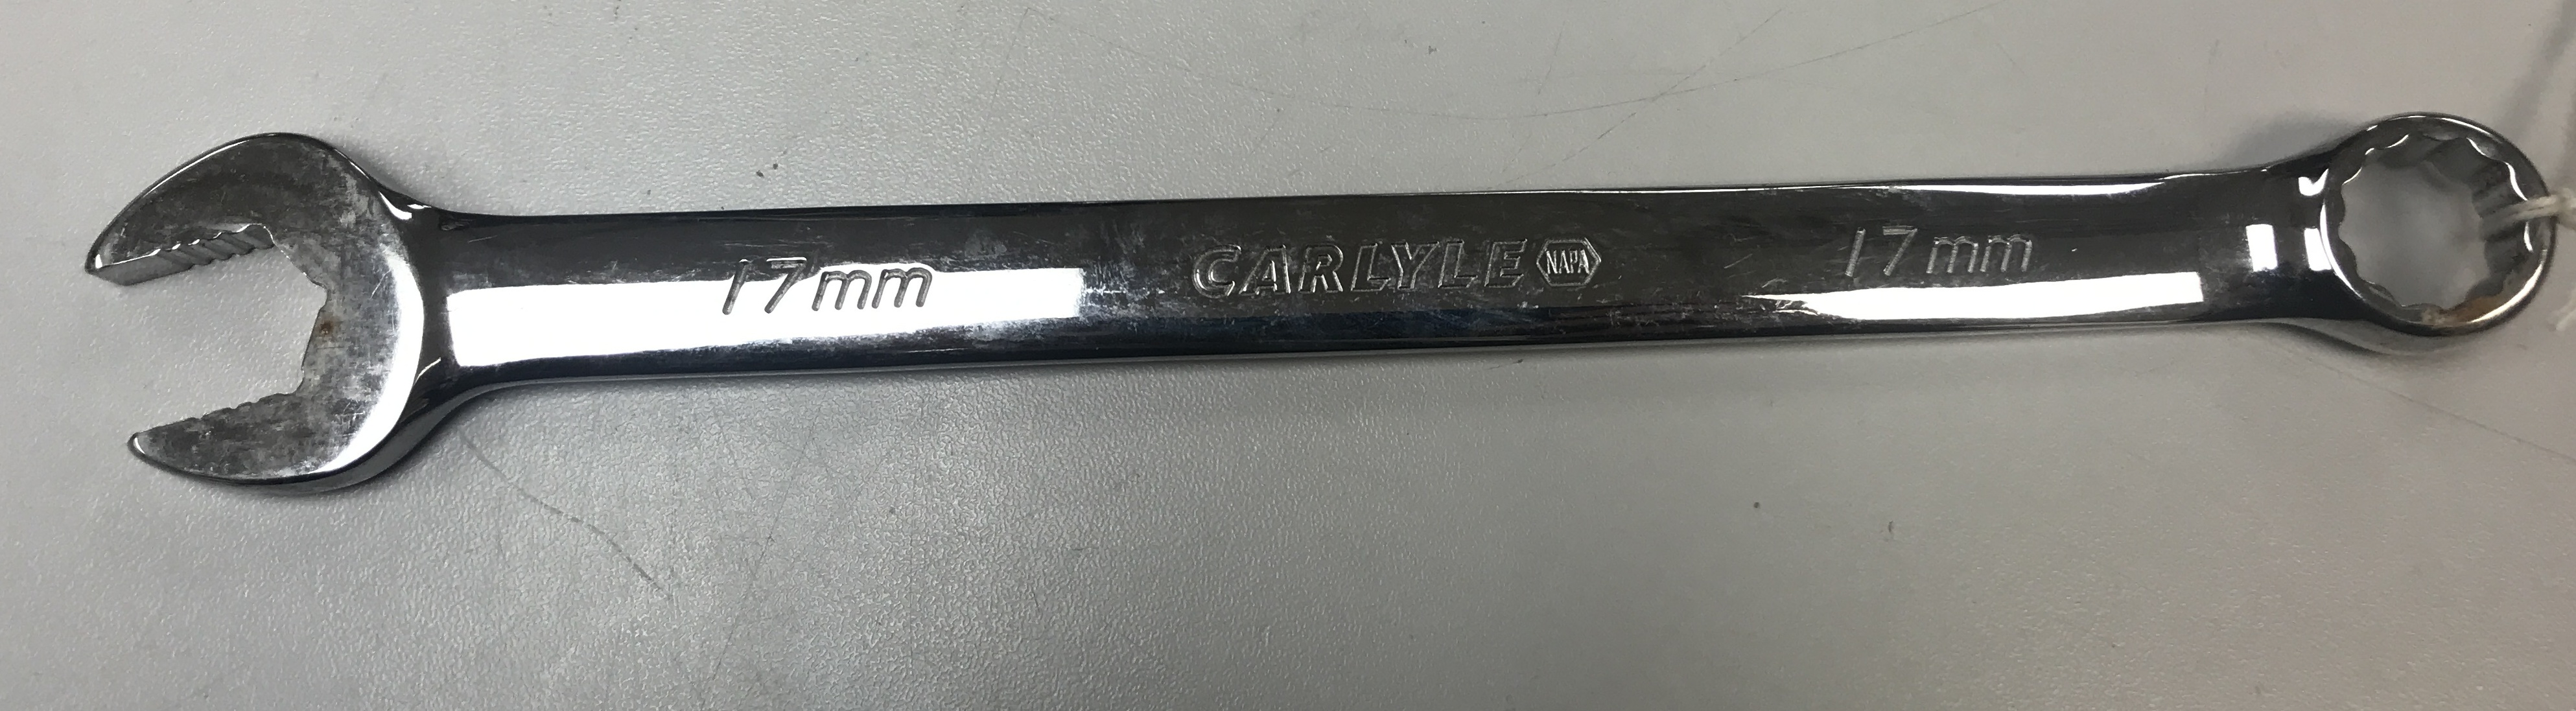 NAPA Carlyle CWLNS117M 17mm